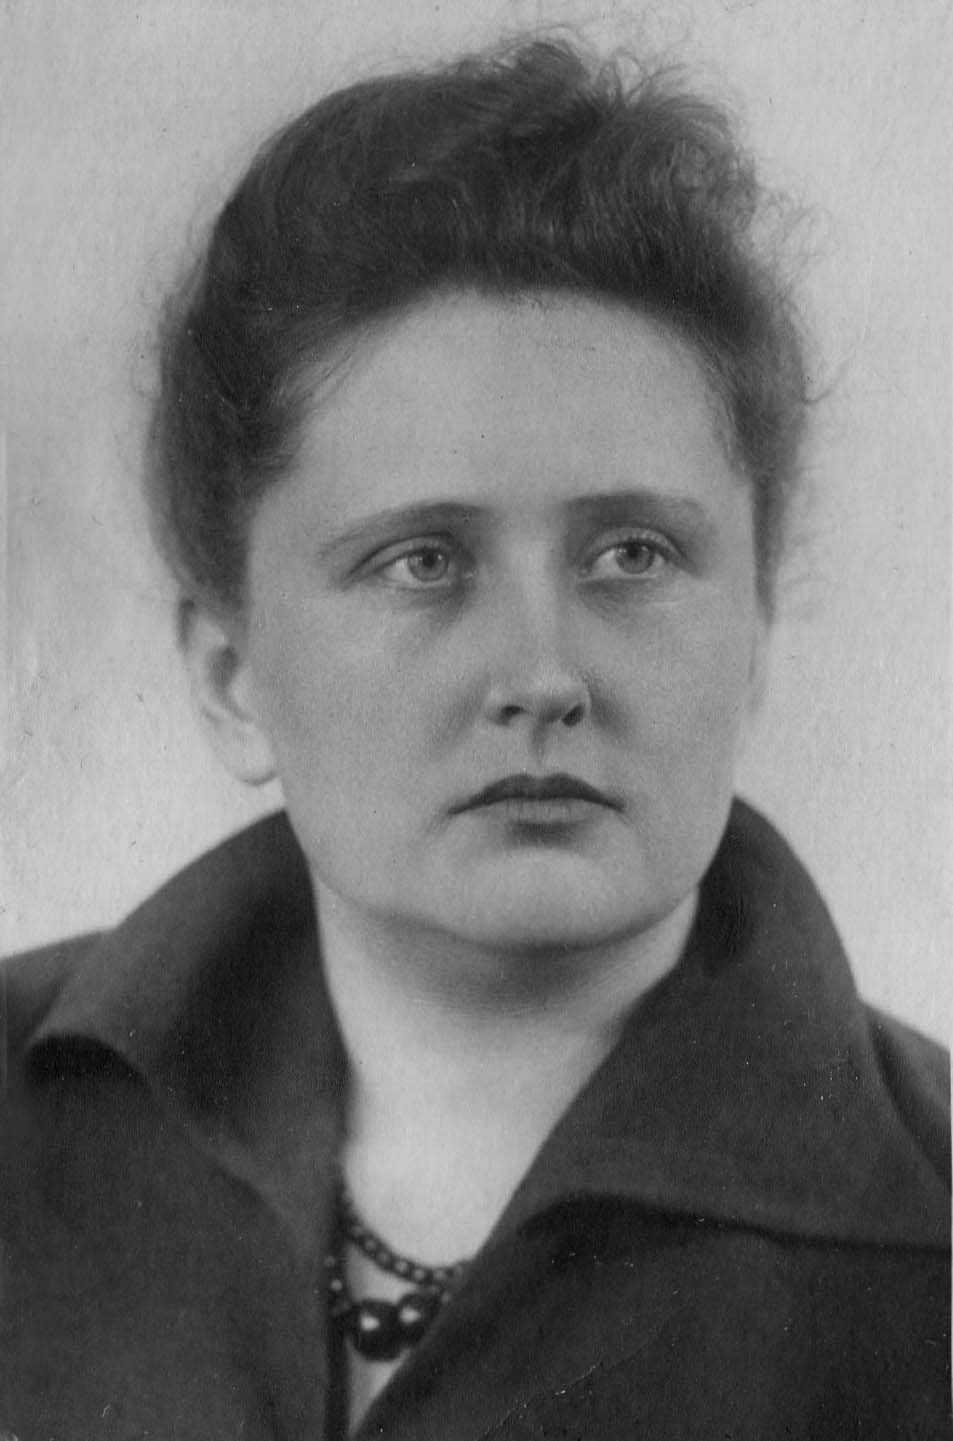 Экспонат #44. Мая Николаевна Попова. 1953 год